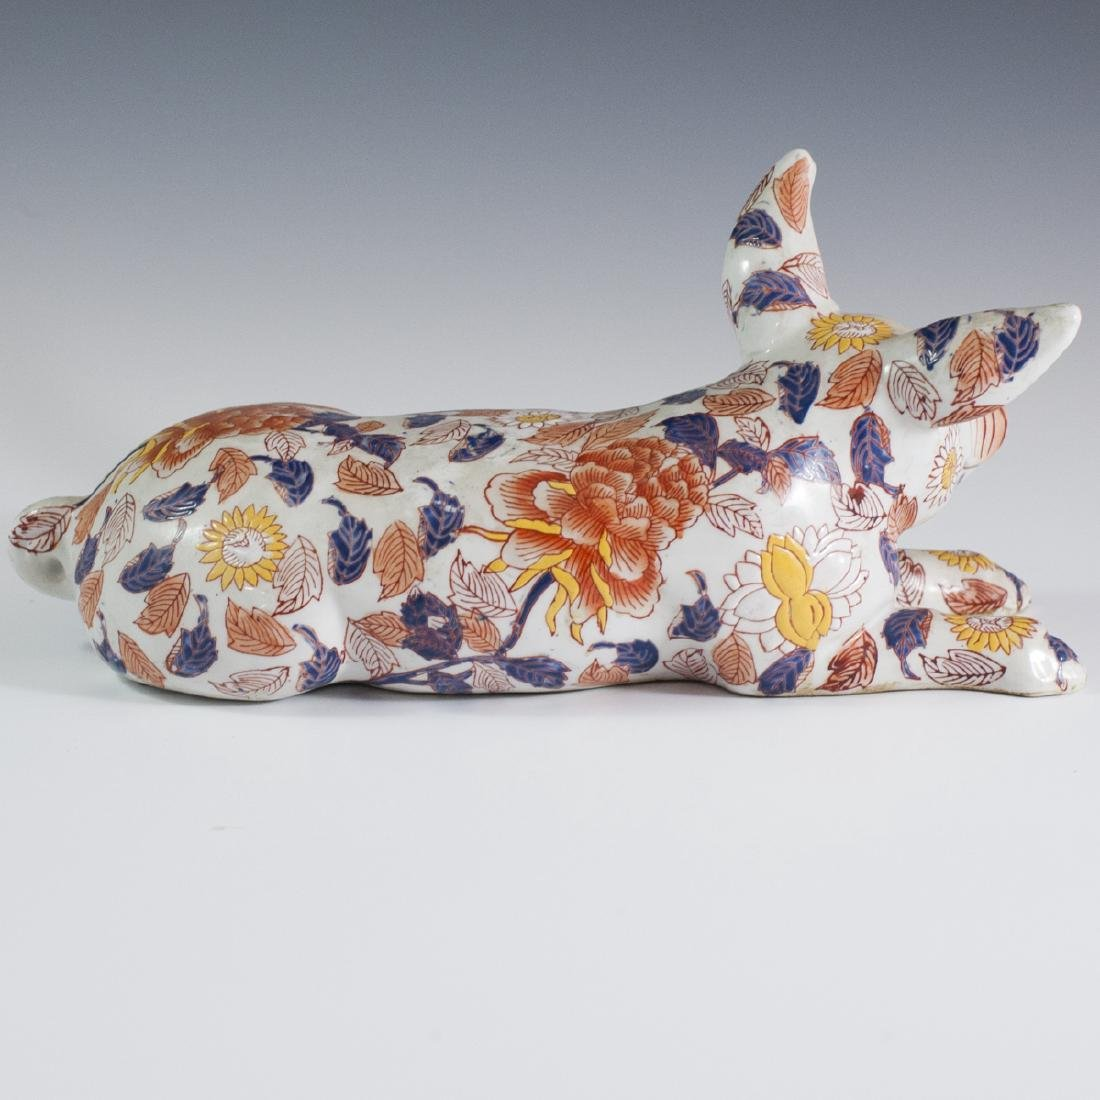 Japanese Enameled Imari Porcelain Pig - 4